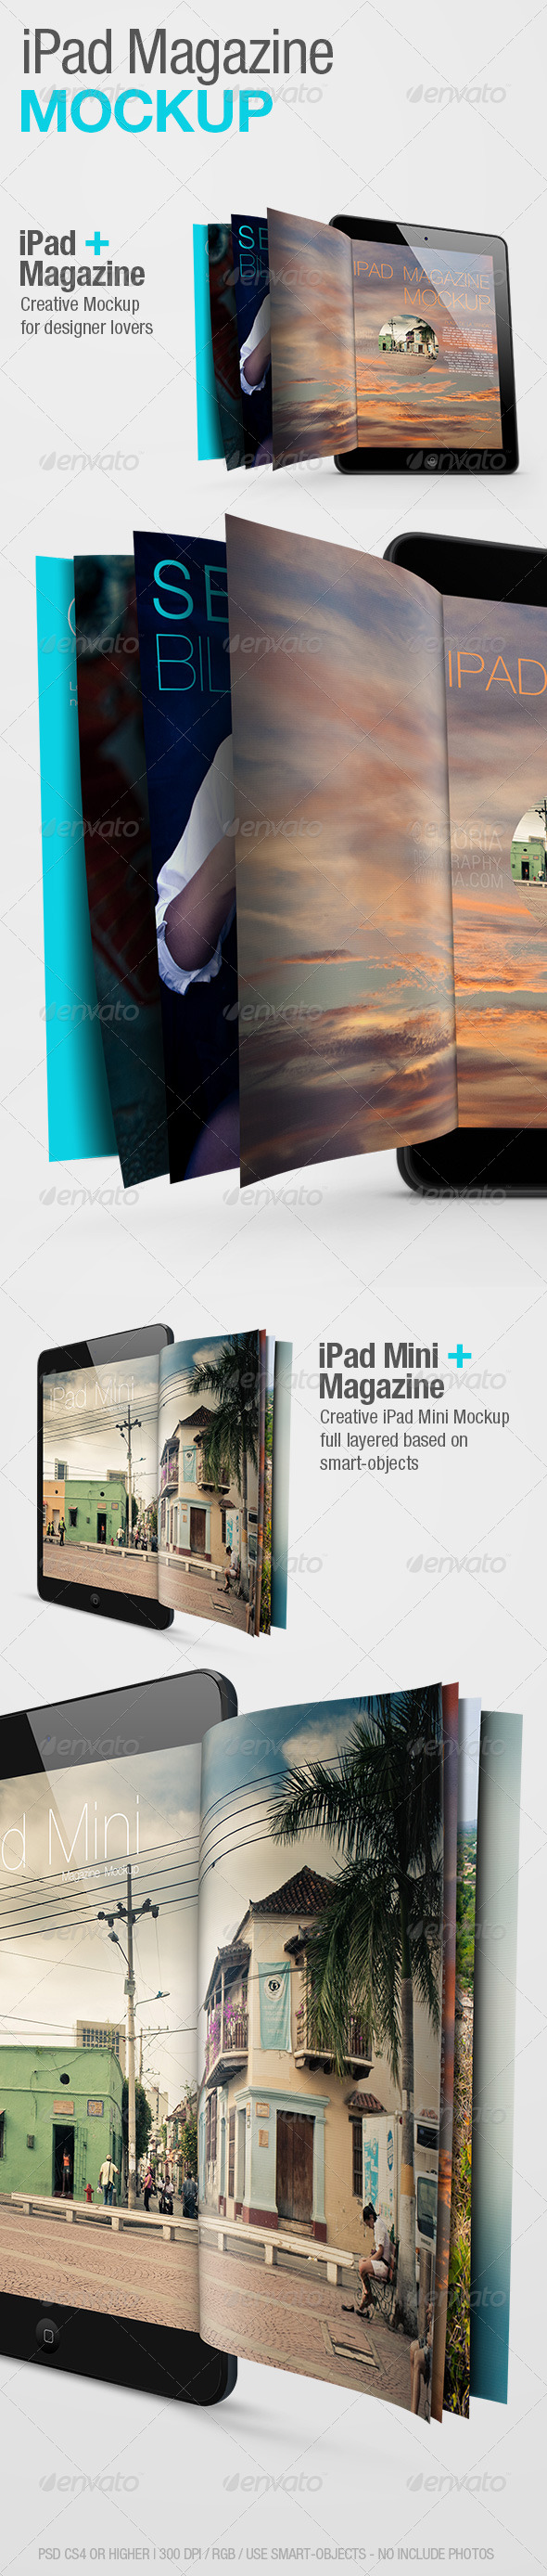 GraphicRiver iPad Magazine Mockup 4066329